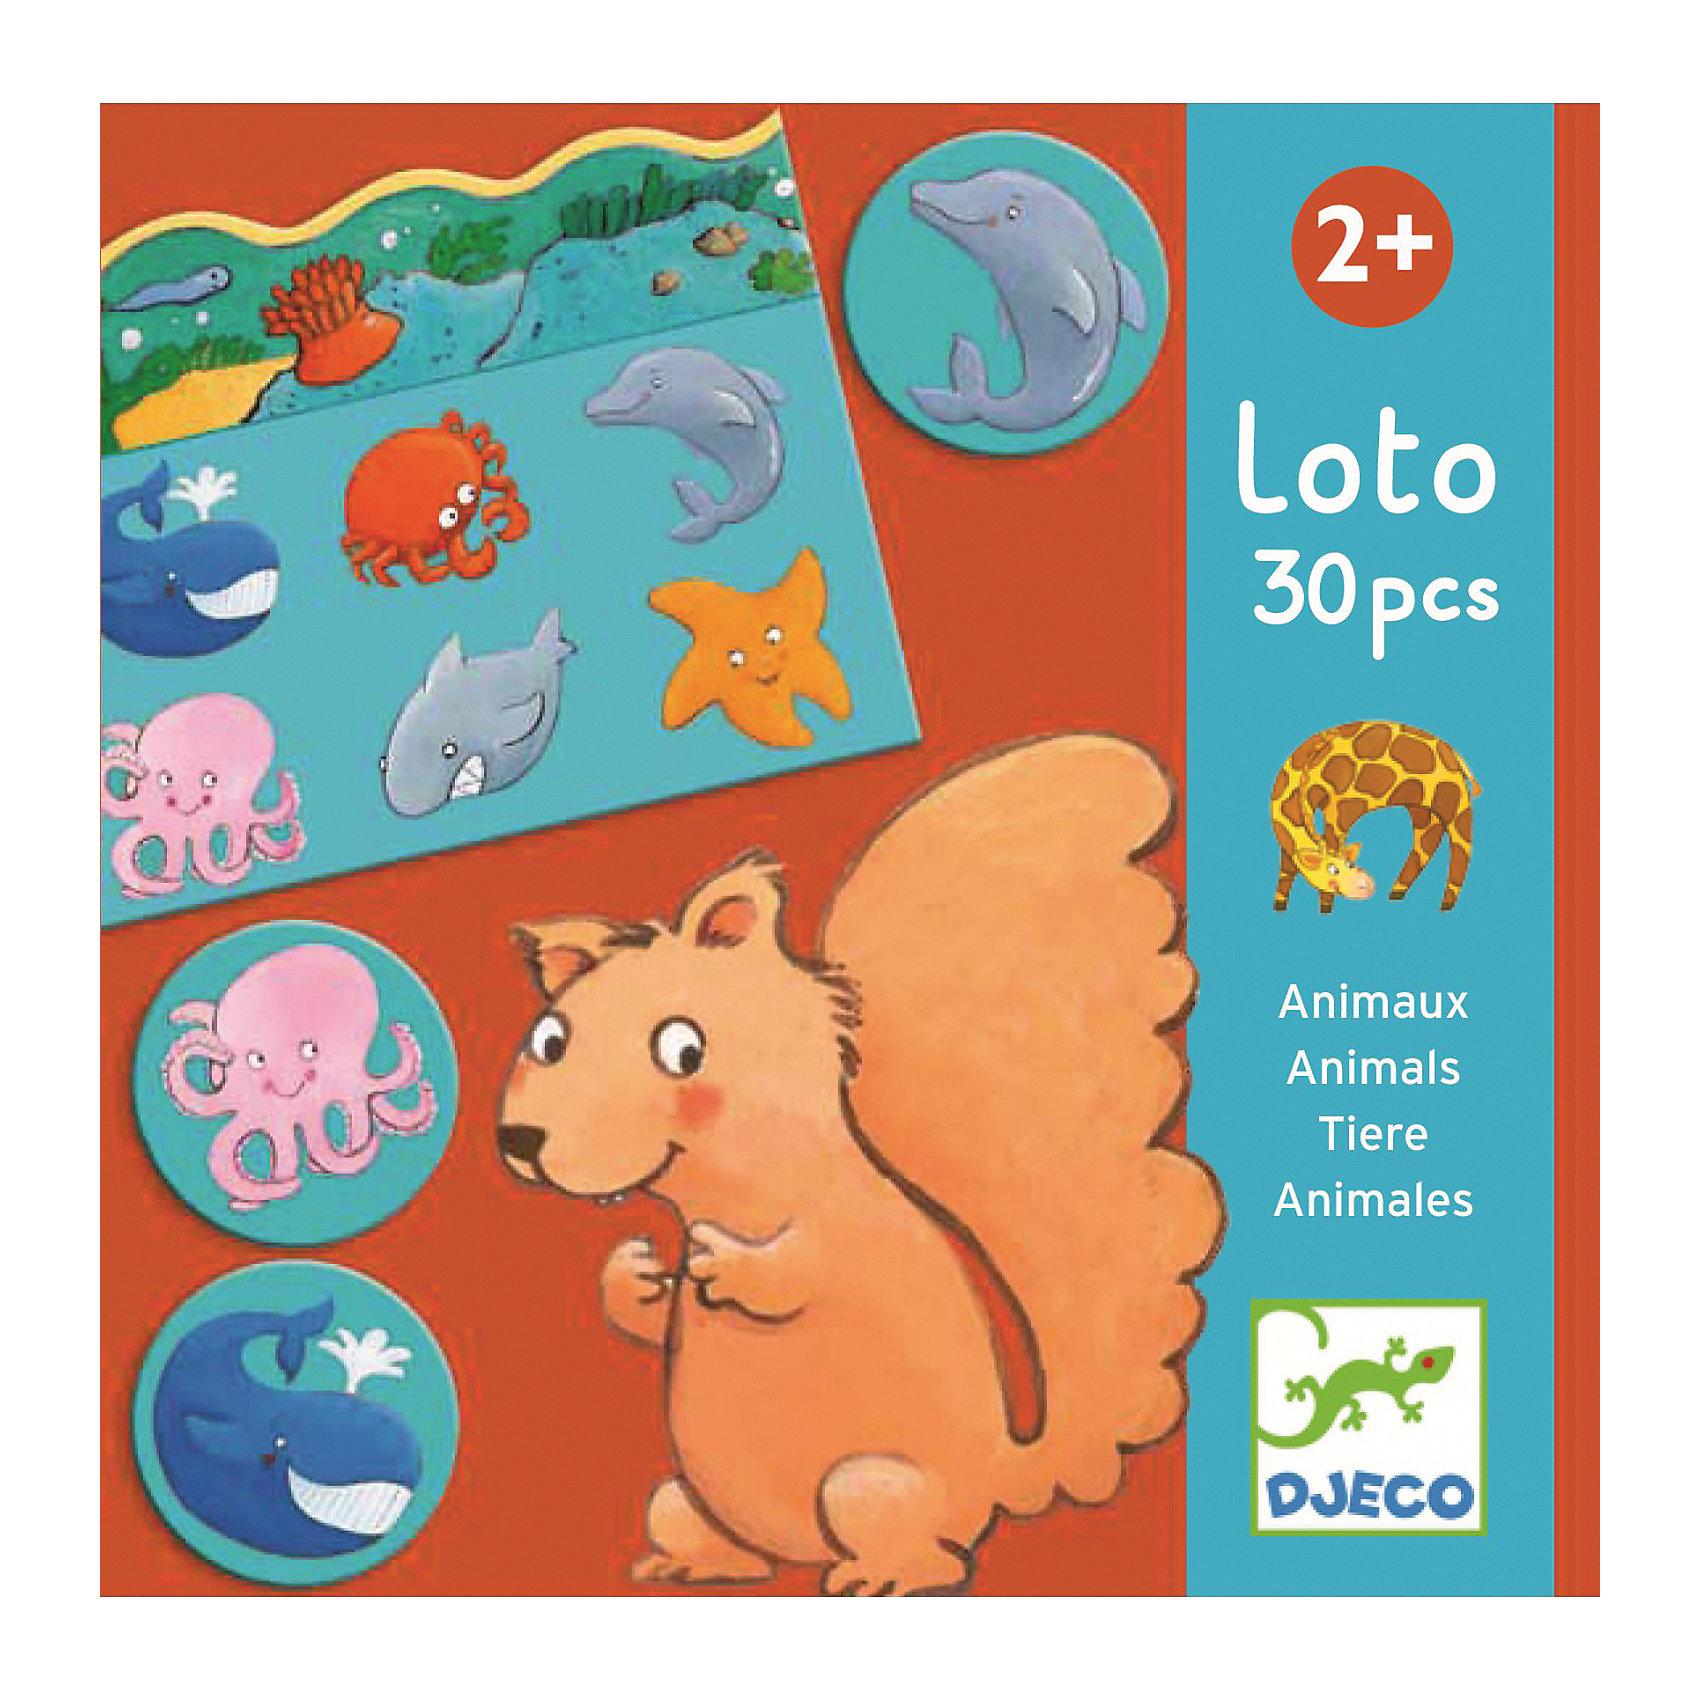 DJECO Детское лото Животные, DJECO djeco игра тактильное лото животные djeco